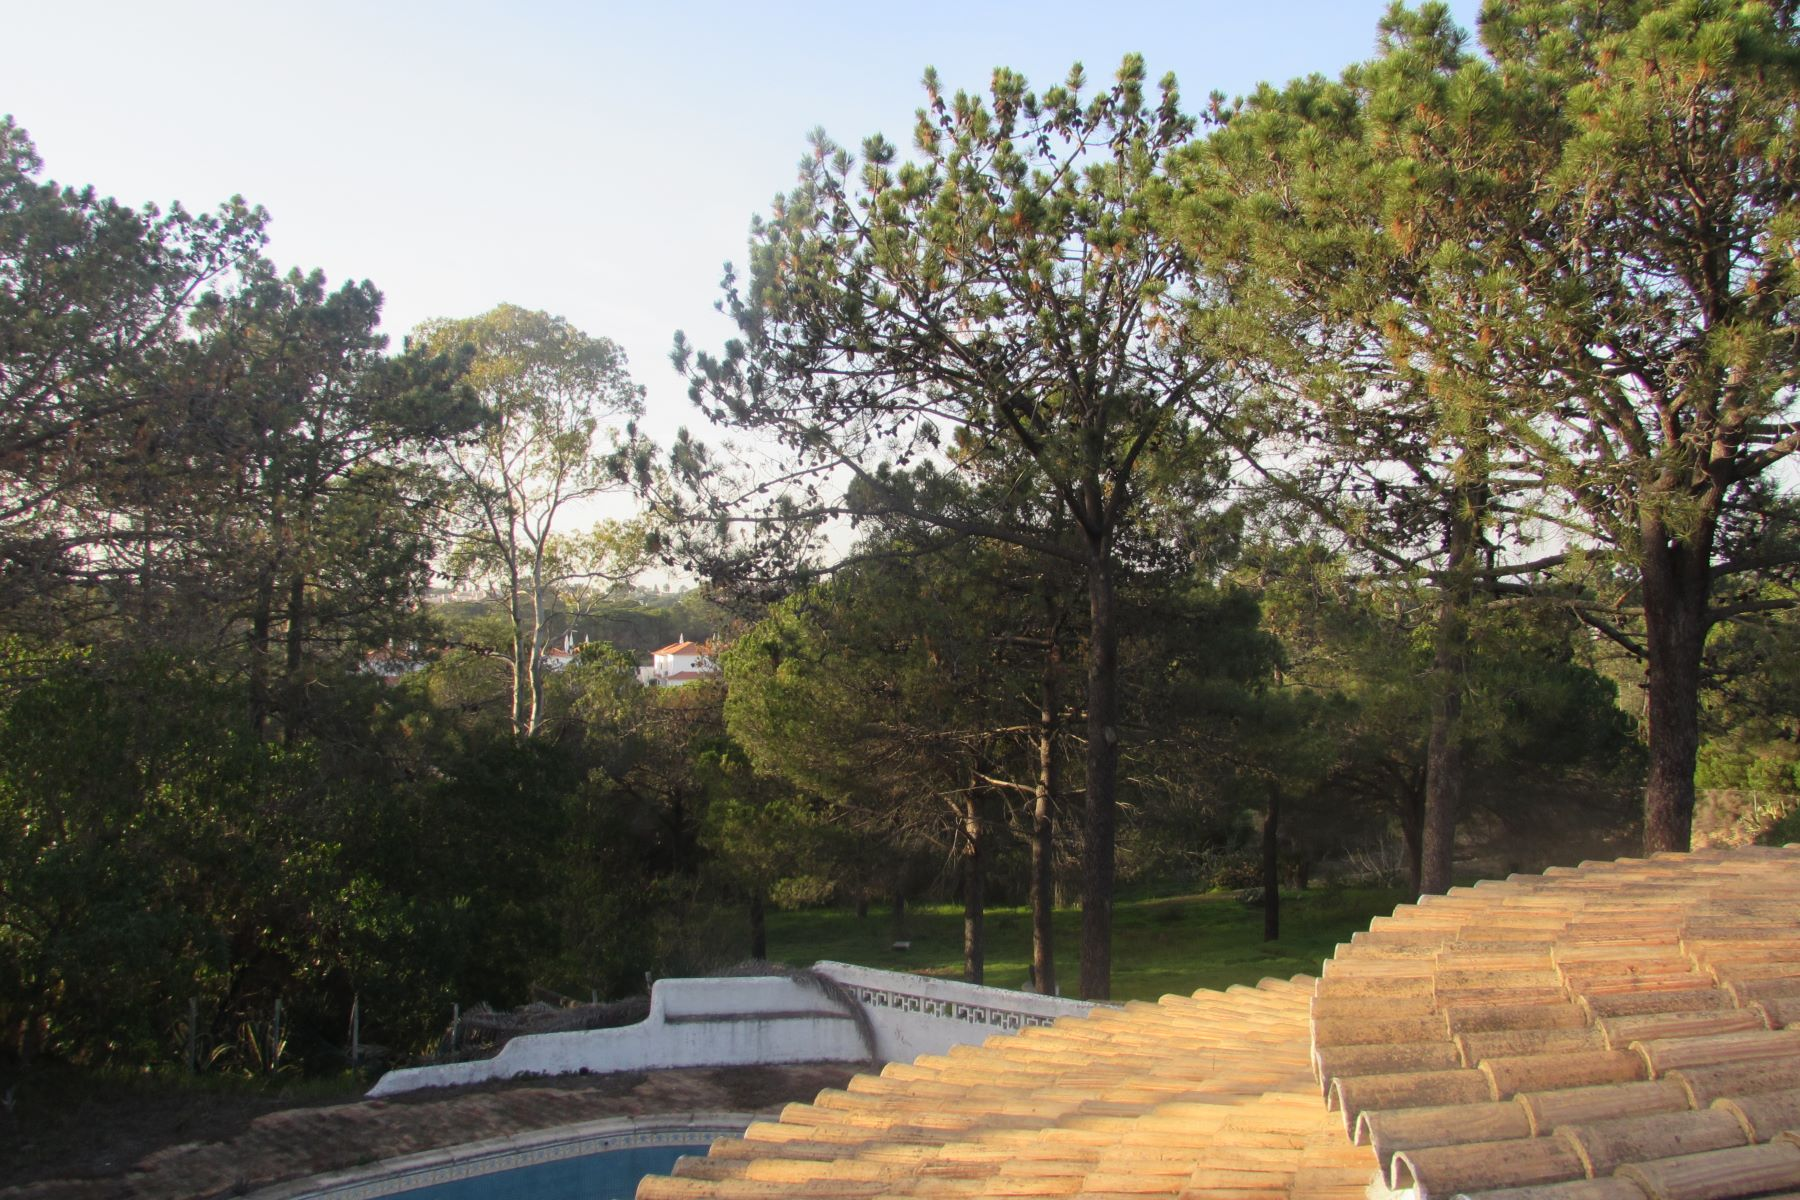 Terrain pour l à vendre à Terreno com ruina for Sale Loule, Algarve, Portugal